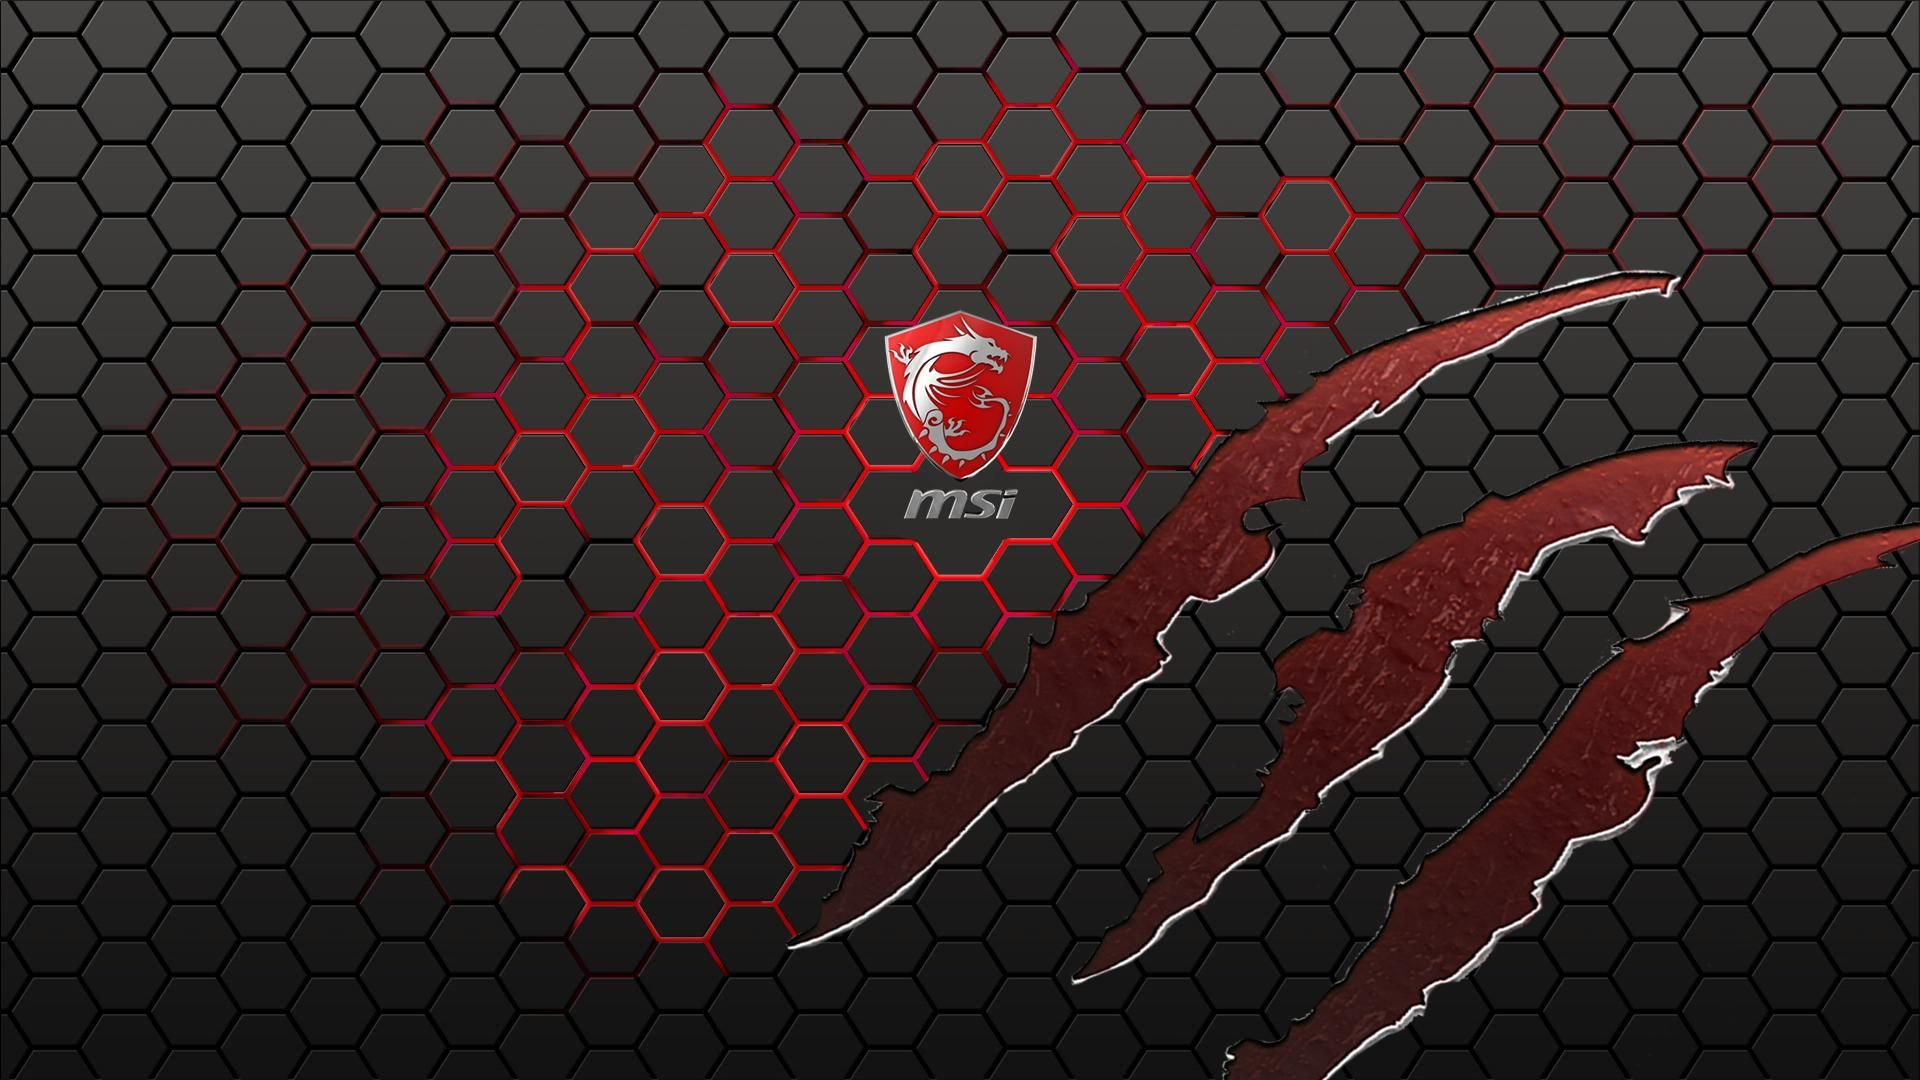 Msi Laptop Background Set 3 Desktop Wallpaper Technology Wallpaper Msi Laptop